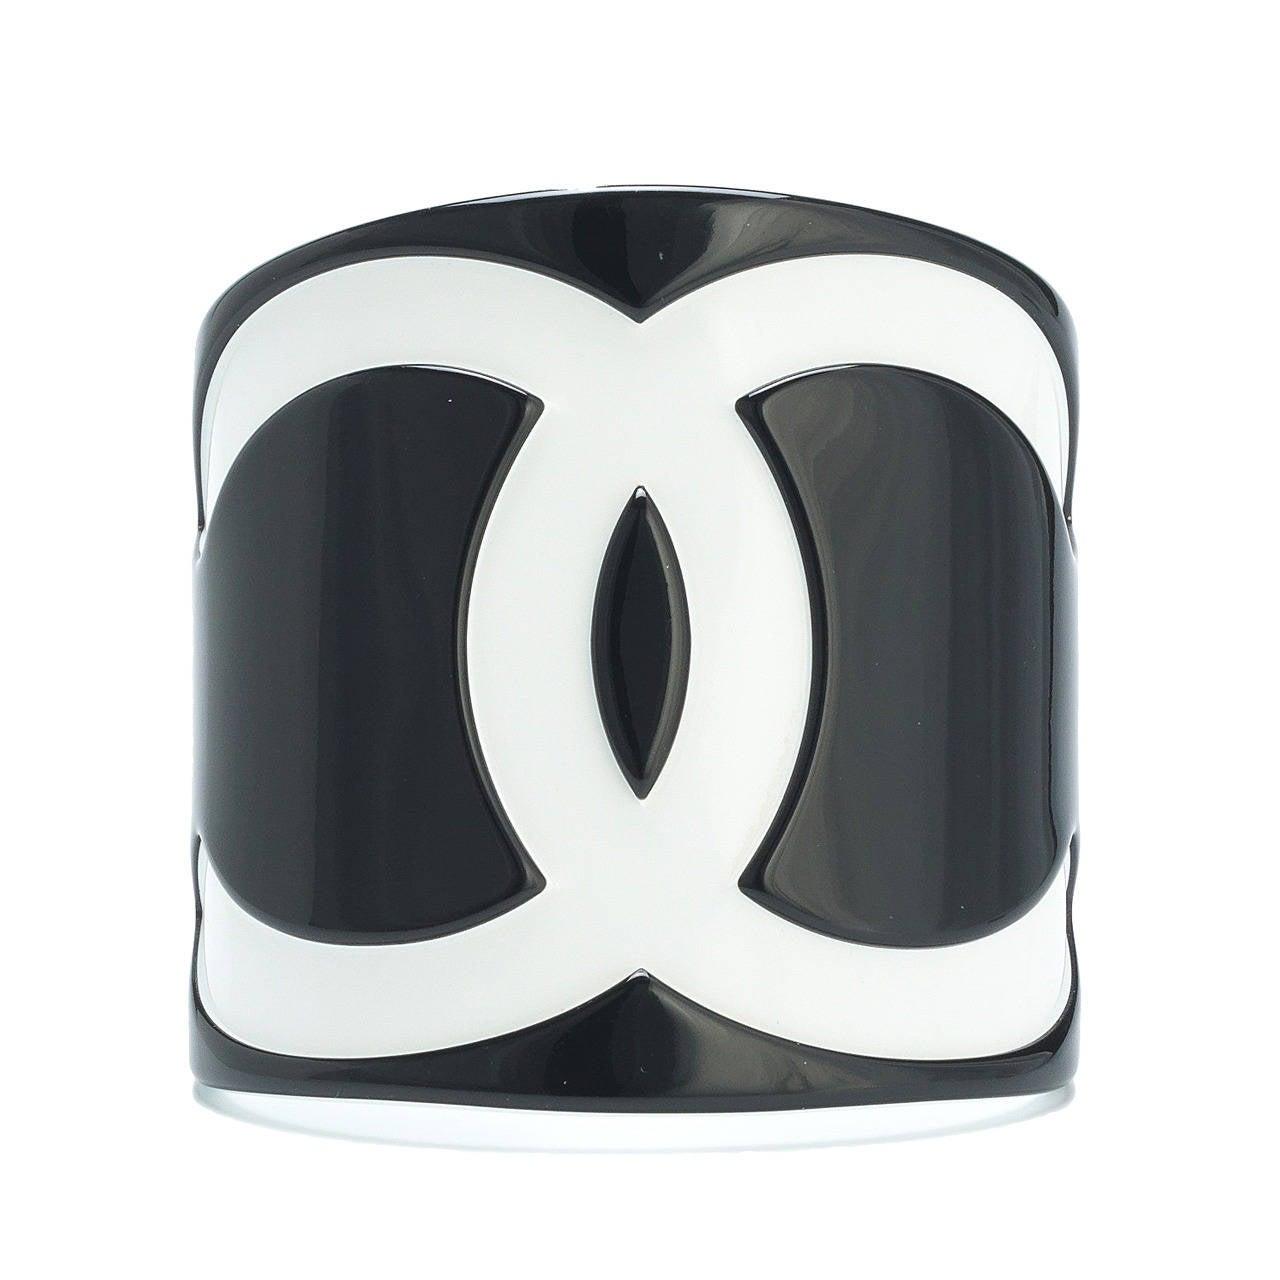 cddd6e38c8e 2005 Chanel Resin Cuff Bracelet W Cc Logo In White On Black